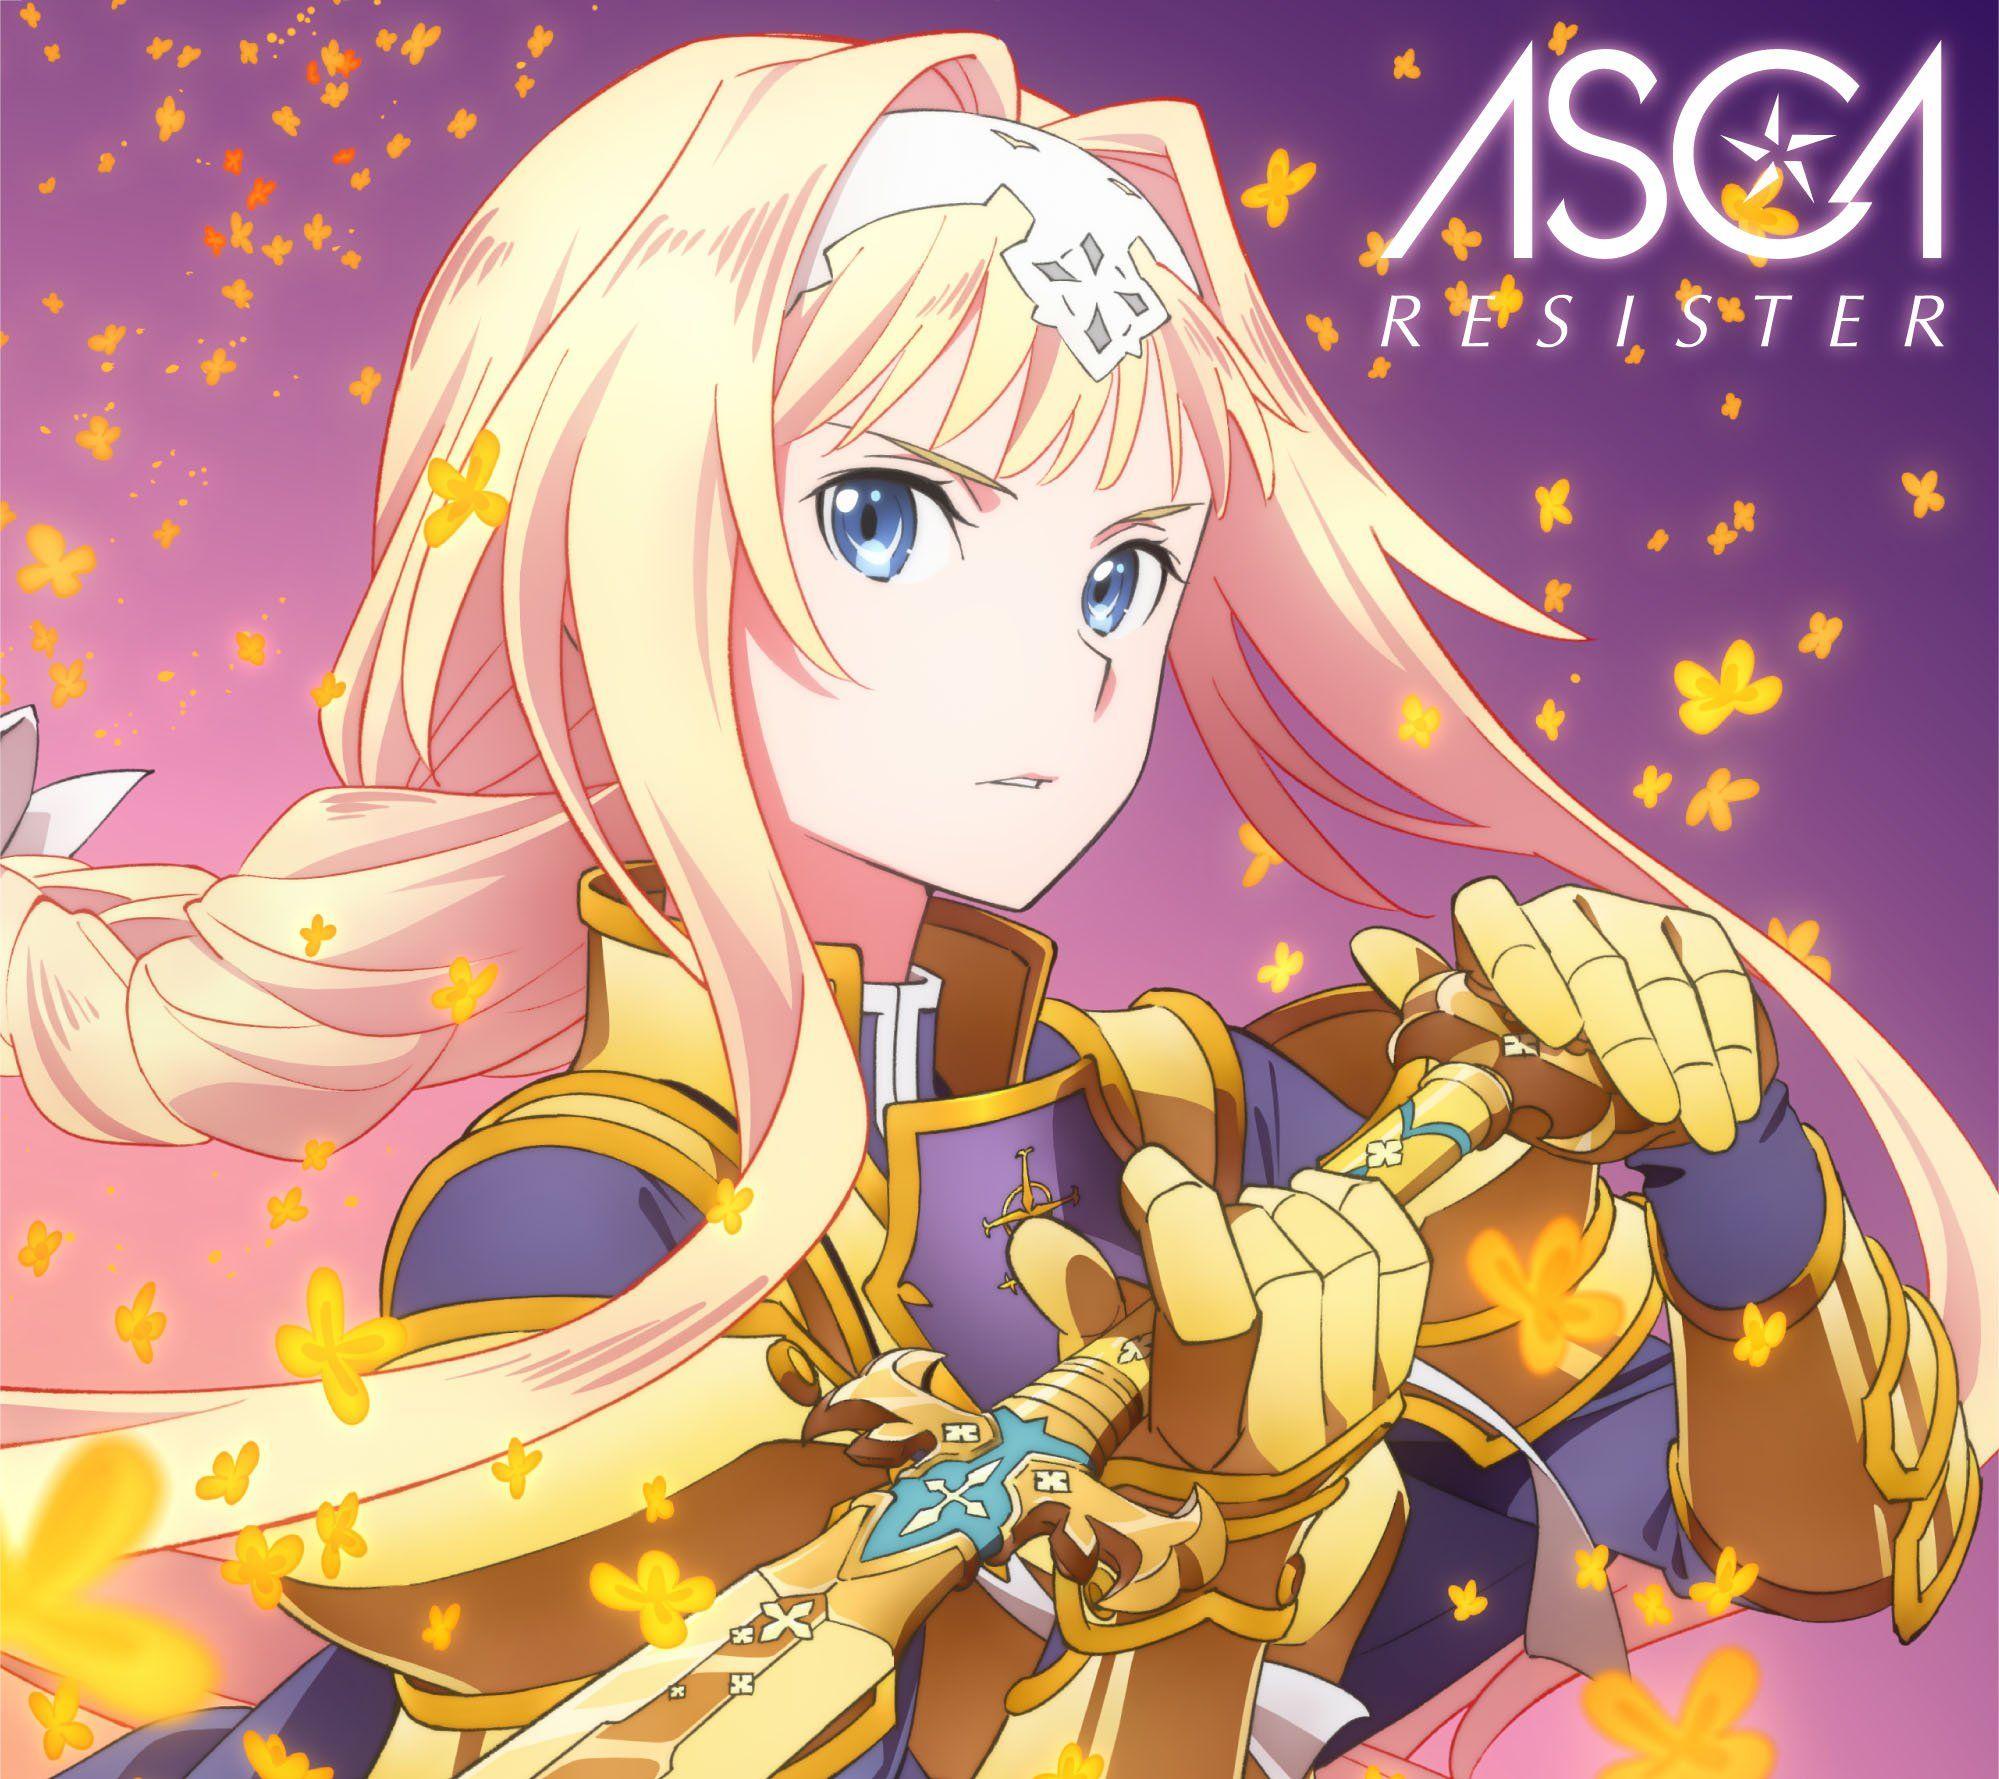 Sword Art Online Alicization Episode 15 discussion